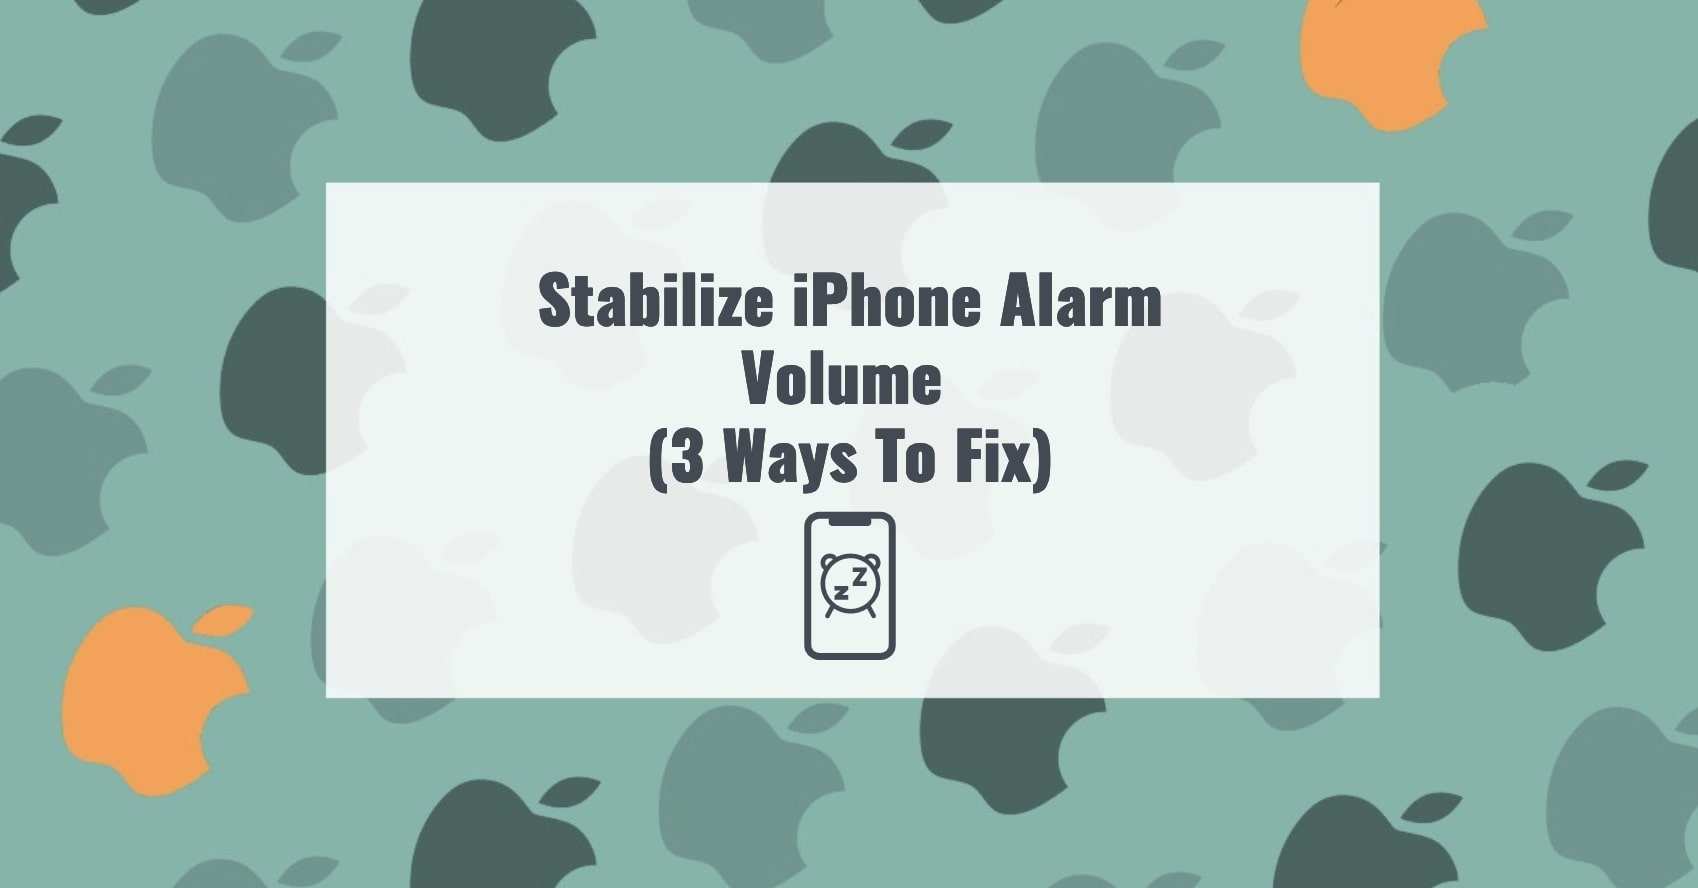 Stabilize iPhone Alarm Volume (3 Ways To Fix)